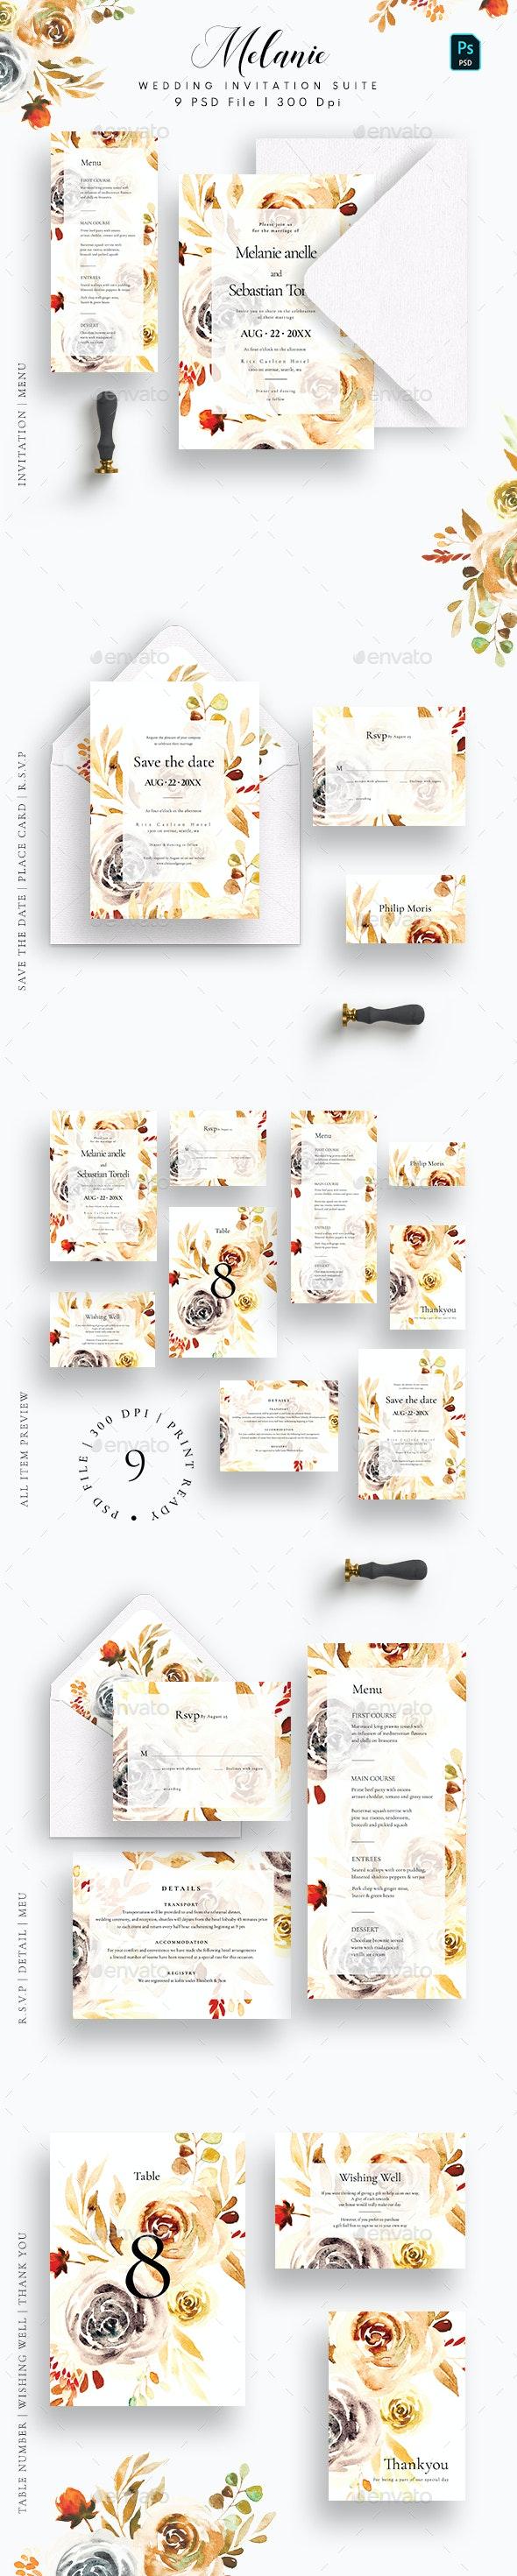 Melanie Wedding Invitation Suite - Weddings Cards & Invites